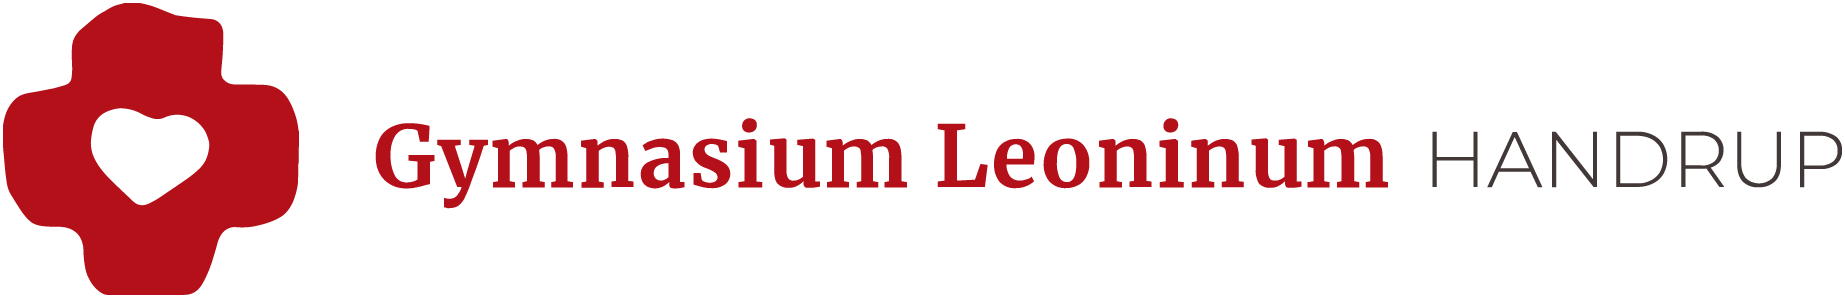 Gymnasium Leoninum Handrup 2020